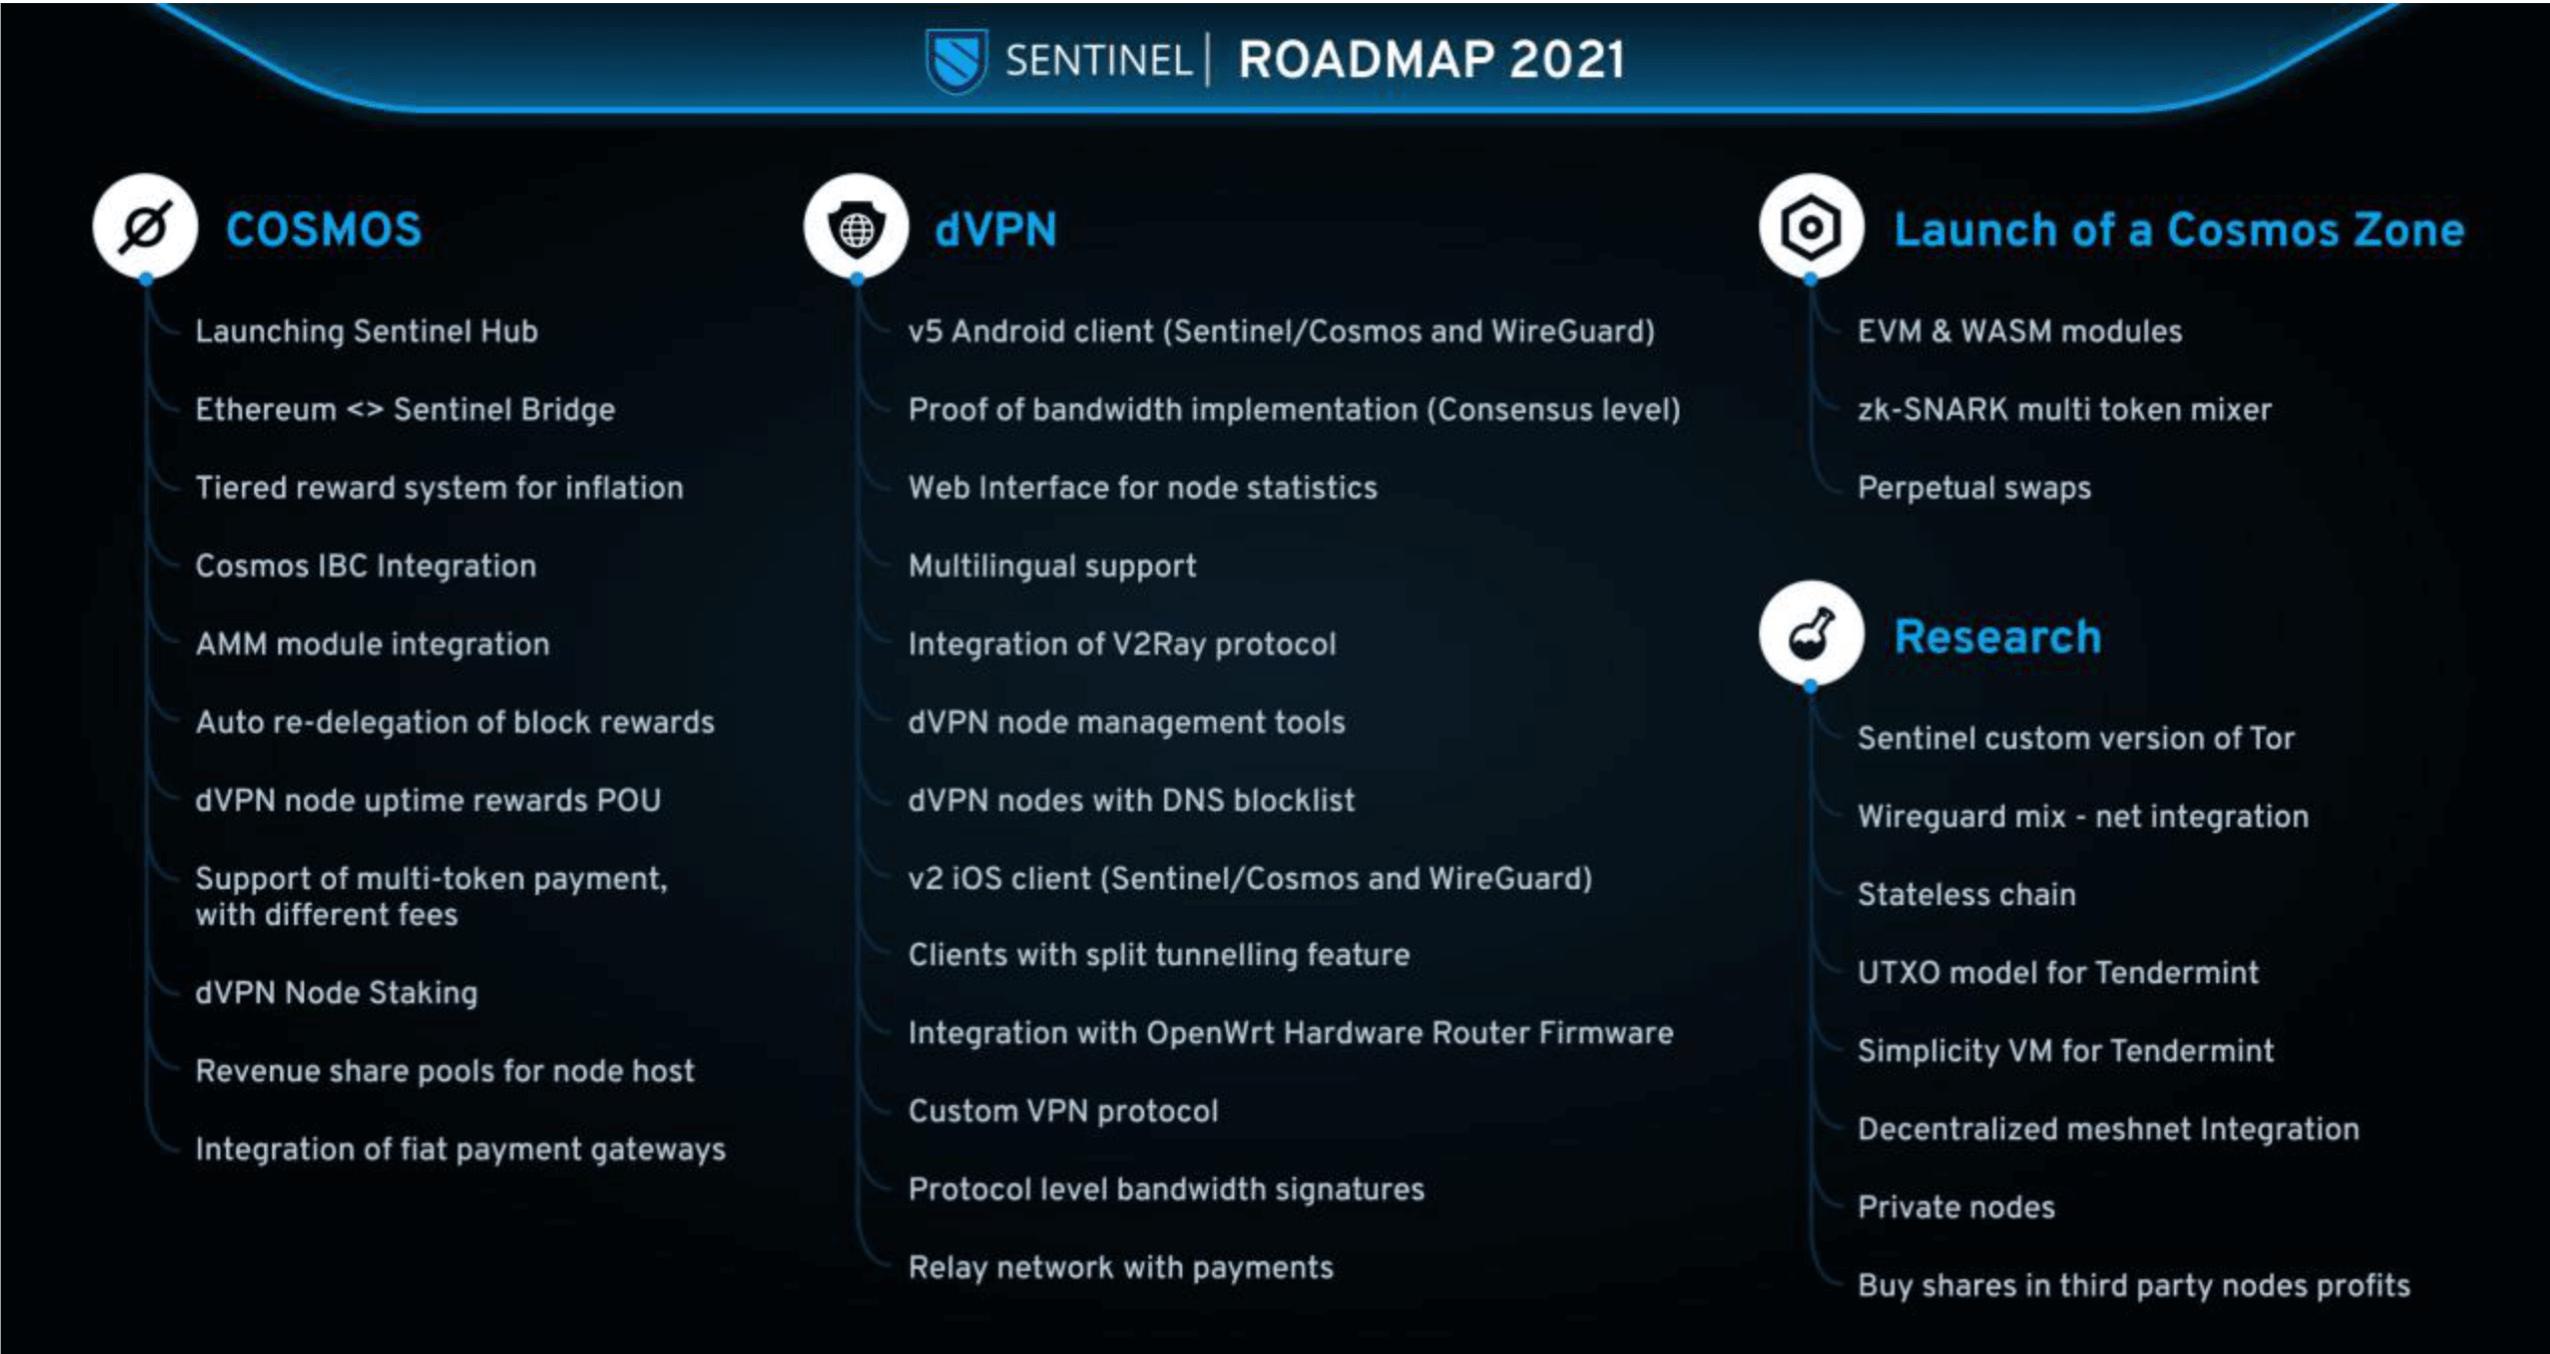 Sentinel Network Roadmap